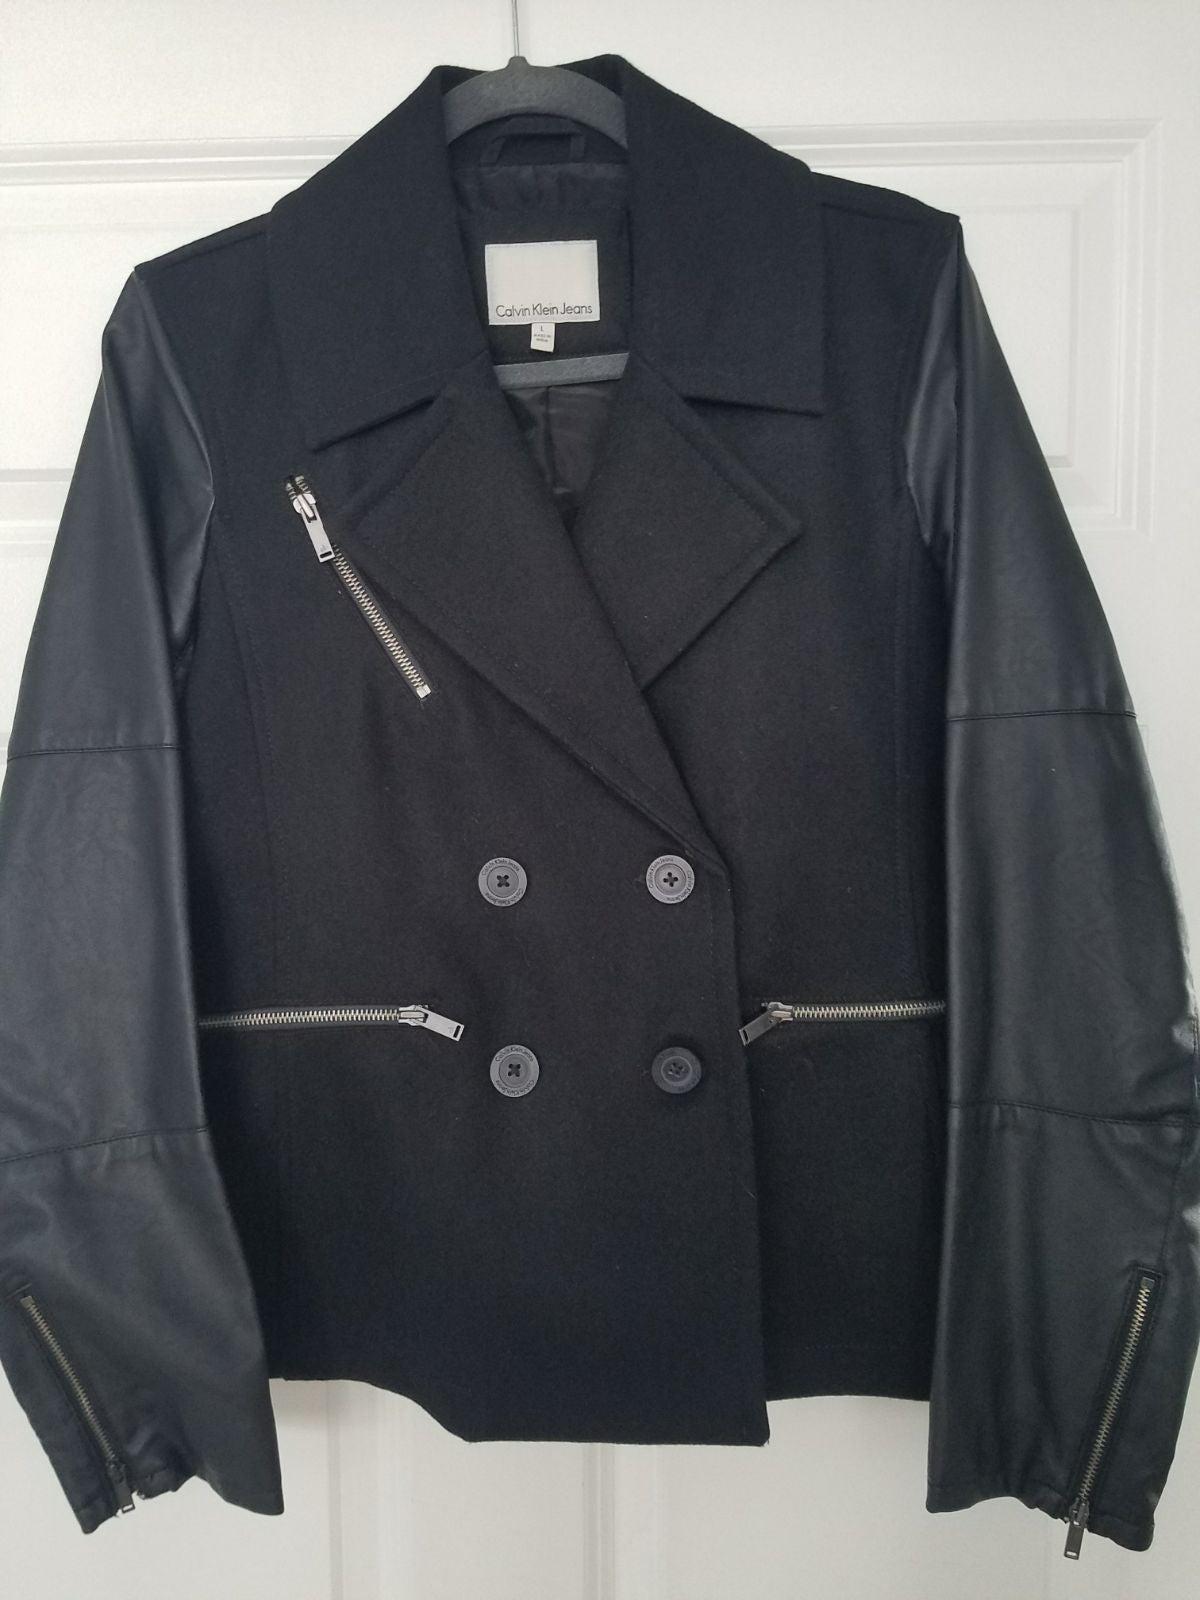 Calvin Klein Coat. Size Large. Lots of n